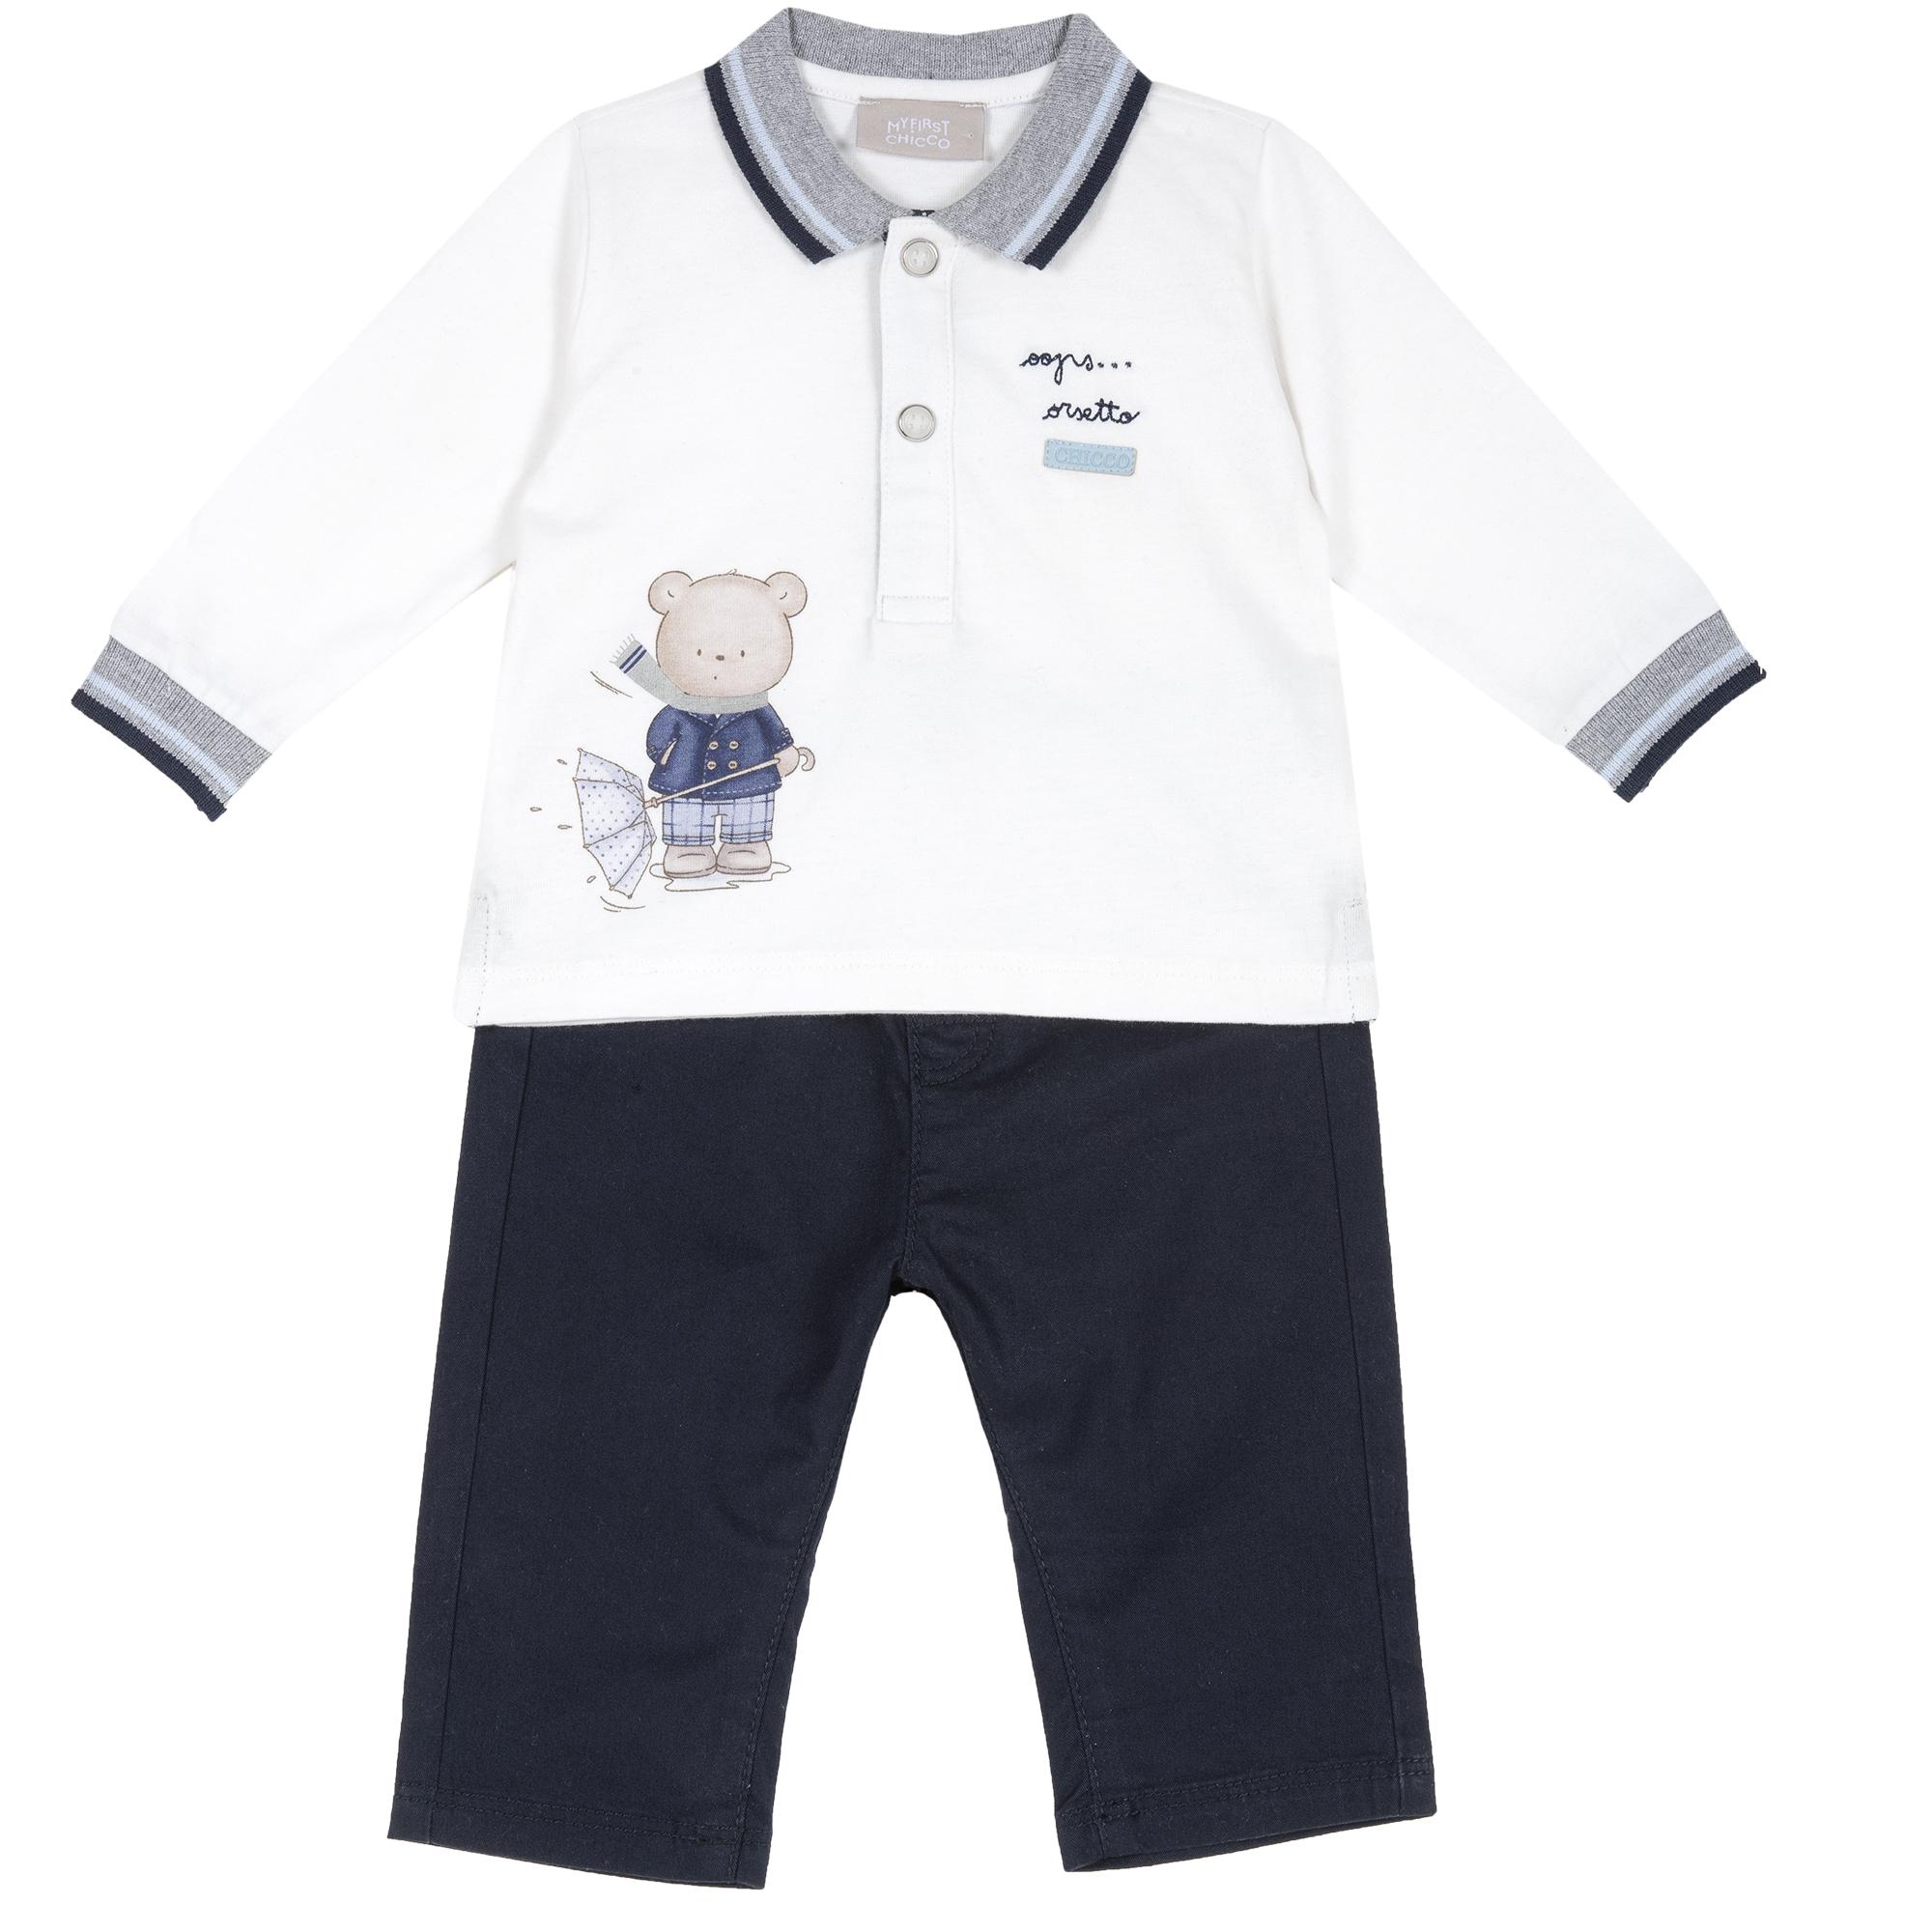 Set Doua Piese, Tricou Si Pantaloni Copii, Albastru, 76578 imagine